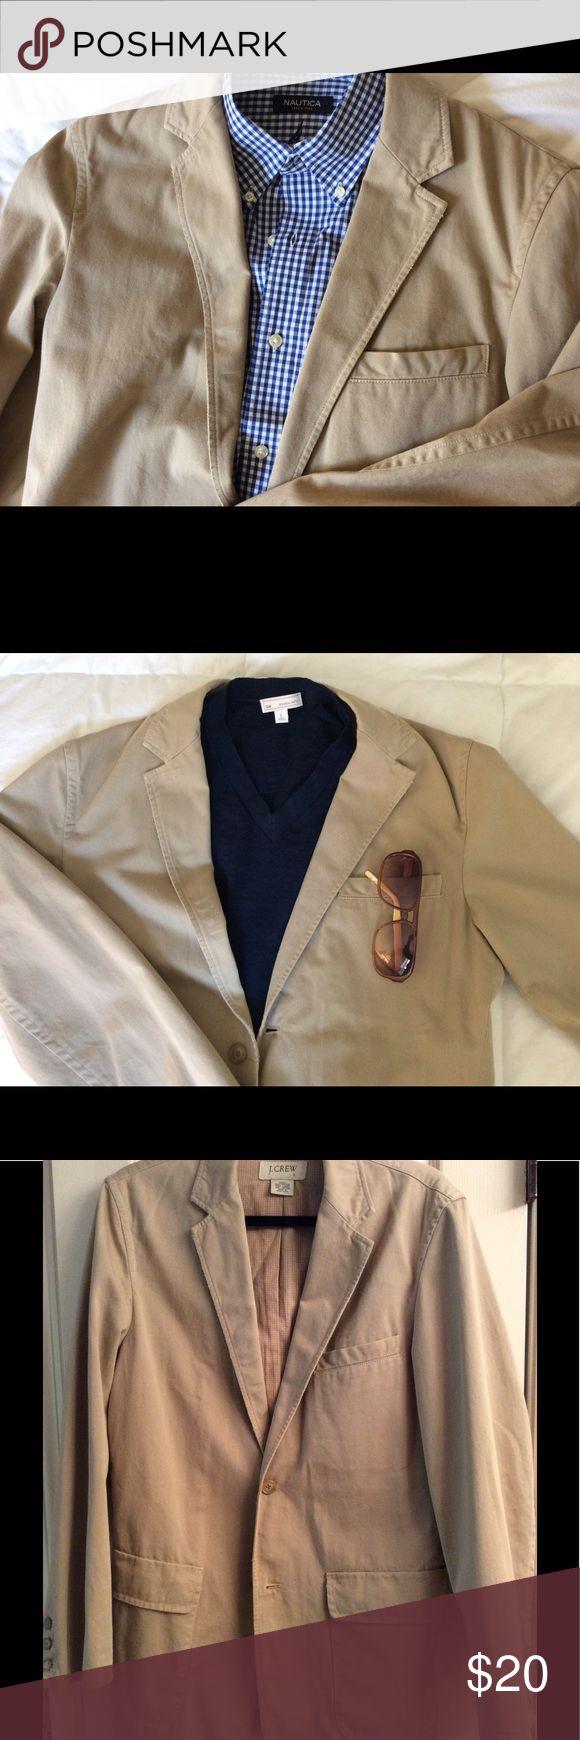 "Price change! Men's JCREW Khaki Blazer, size S Versatile! Back slit, flapped pockets, extra buttons, For that slender fellow. Shoulder-shoulder 19"", top of collar to hem 32"" JCREW Jackets & Coats"